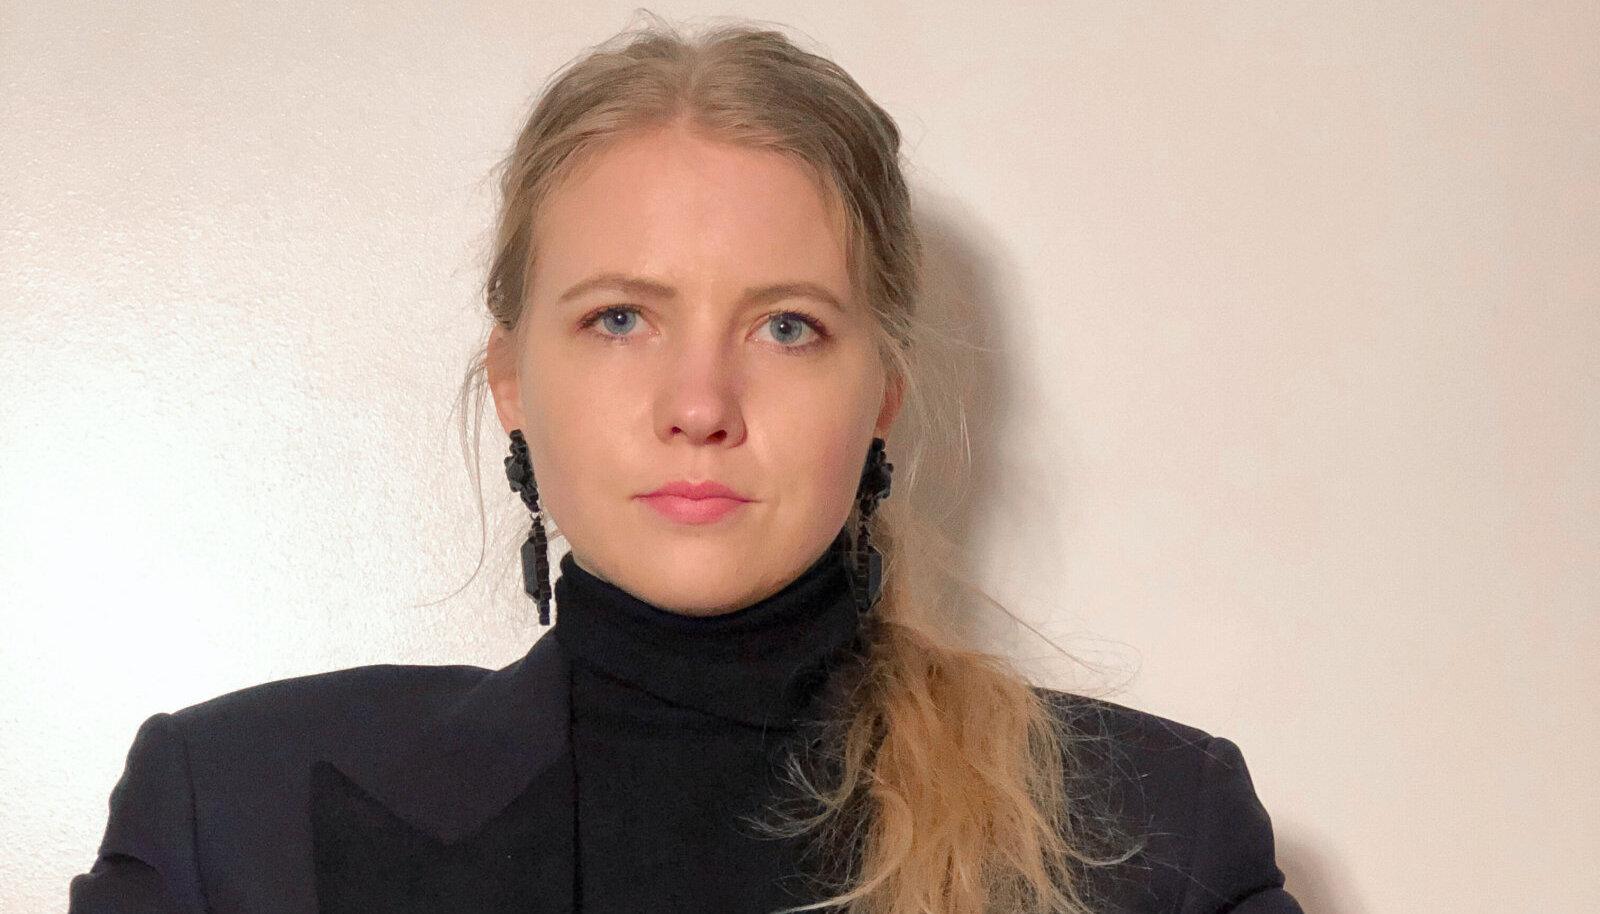 Johanna Ronk